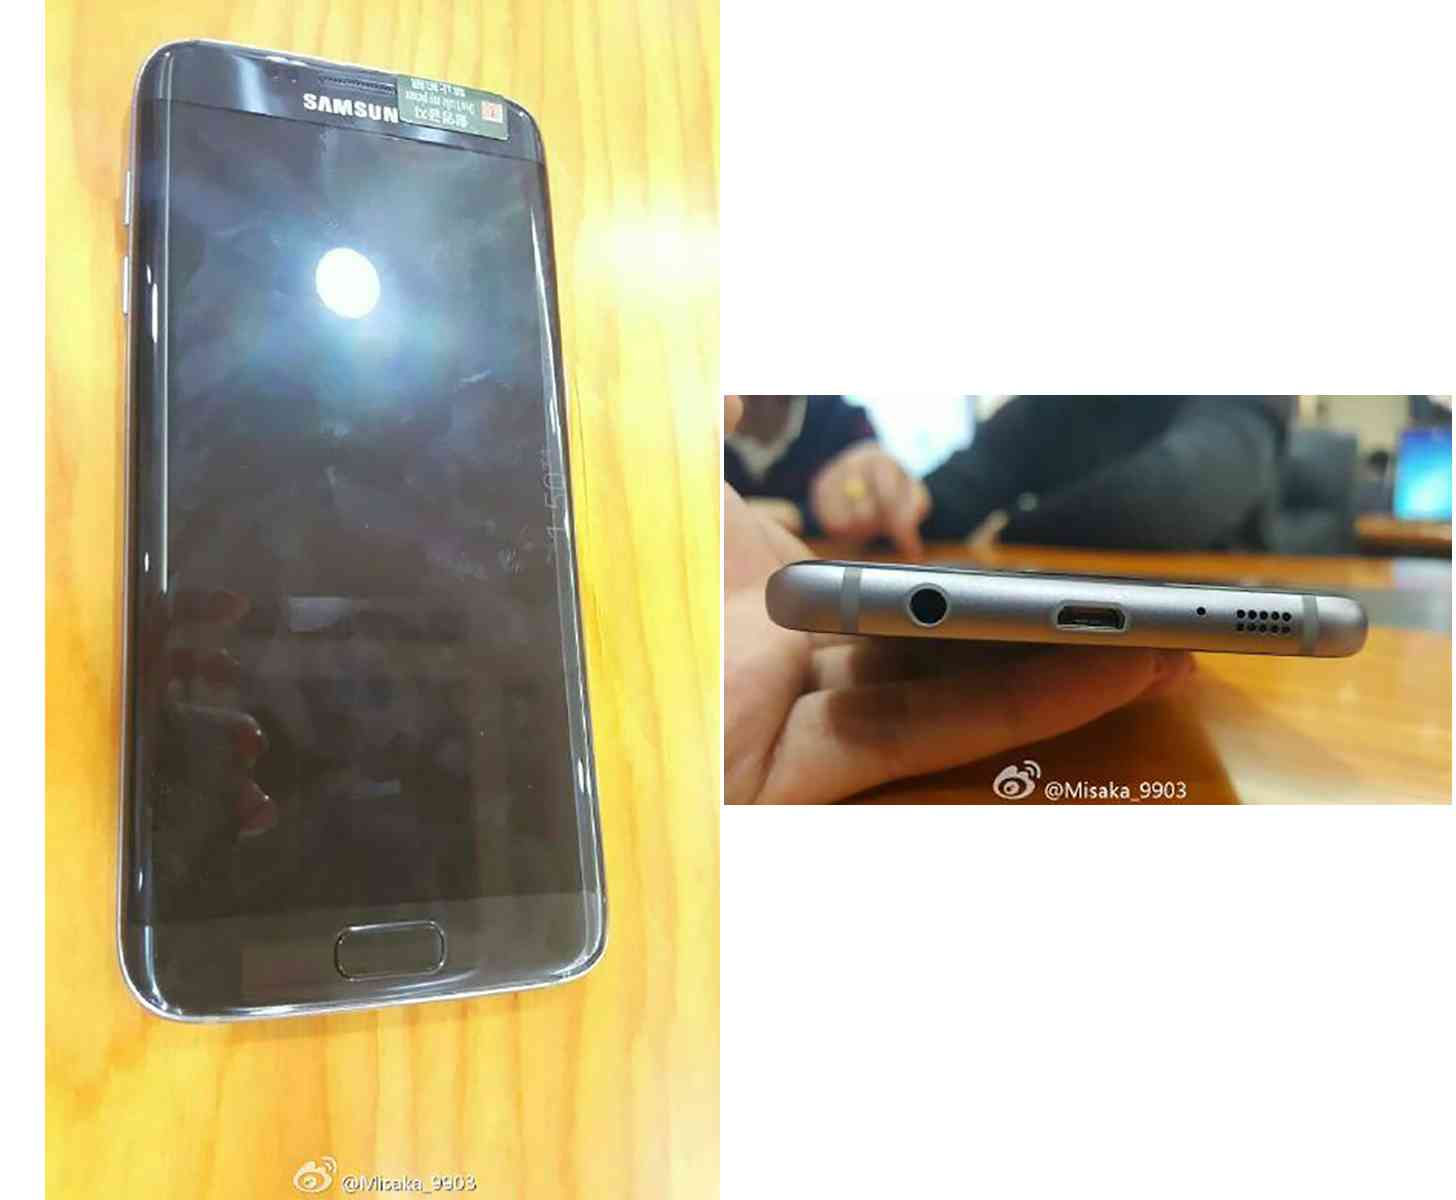 Samsung Galaxy S7 edge photos microUSB